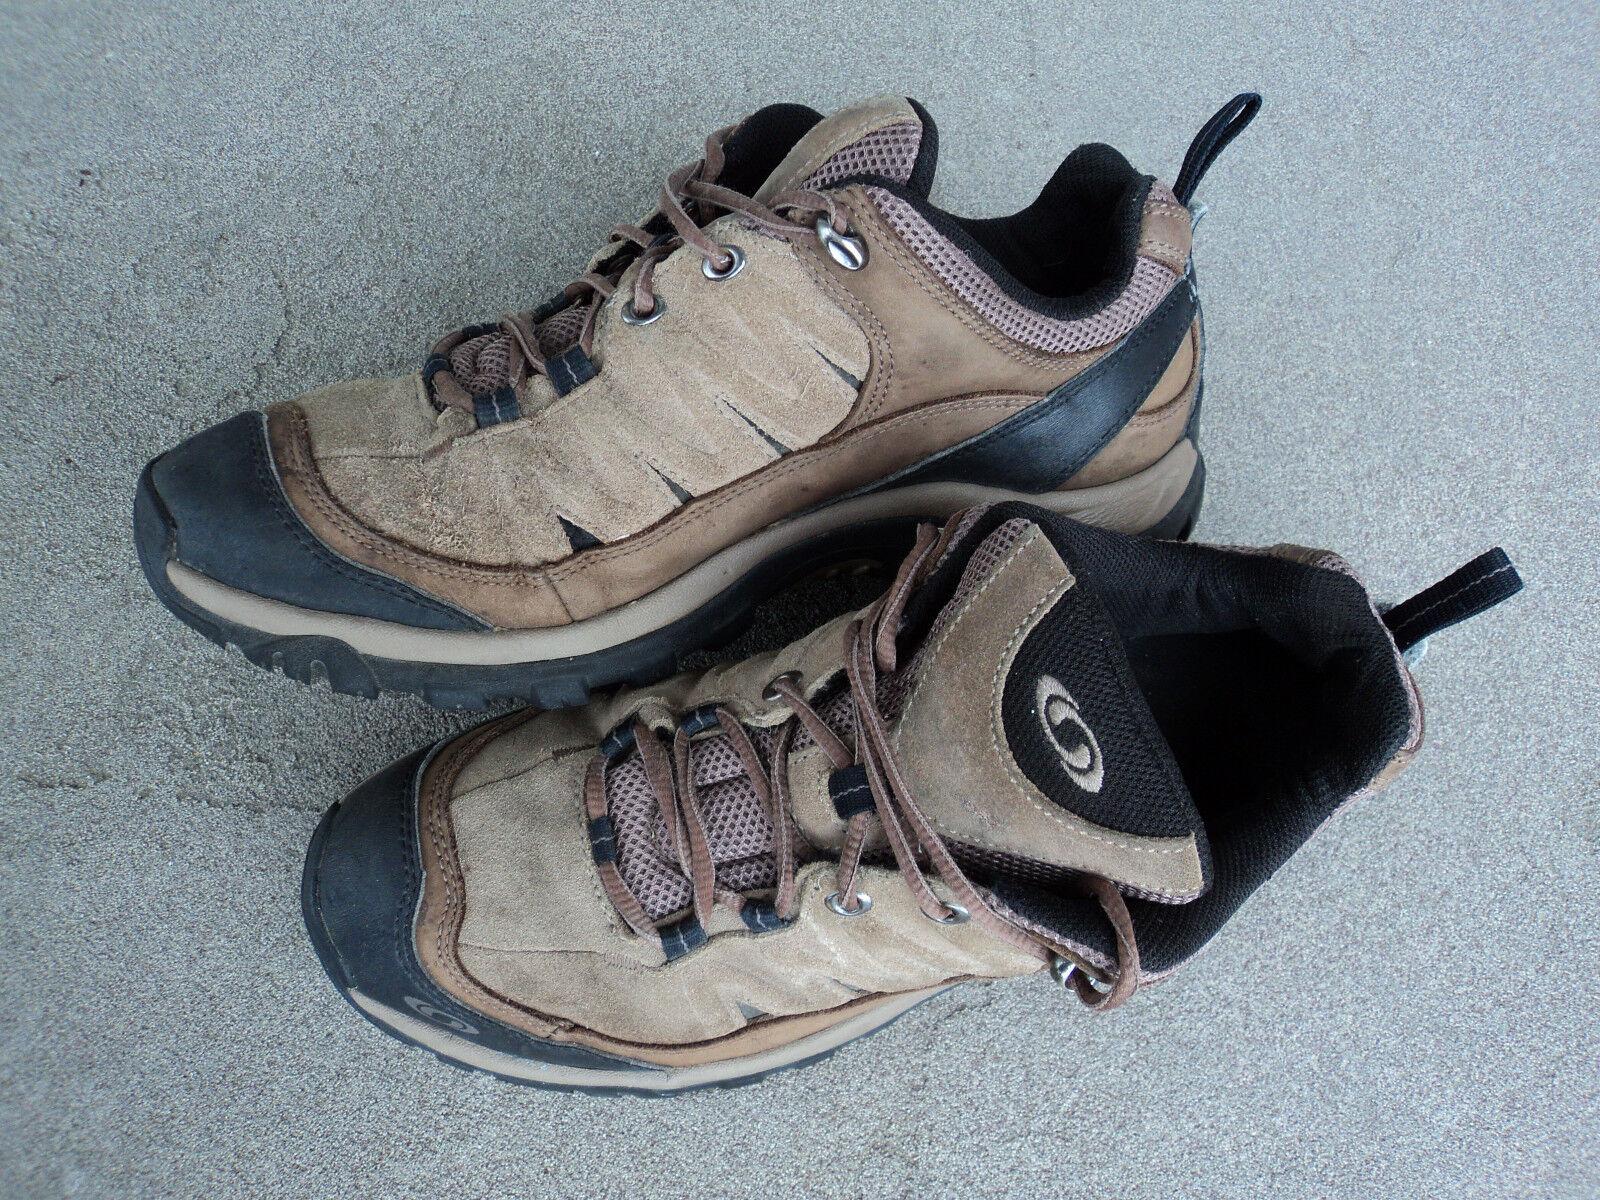 SALOMON Men's US 10 Contagrip Soles shoes Boots Suede Walking Running Trail